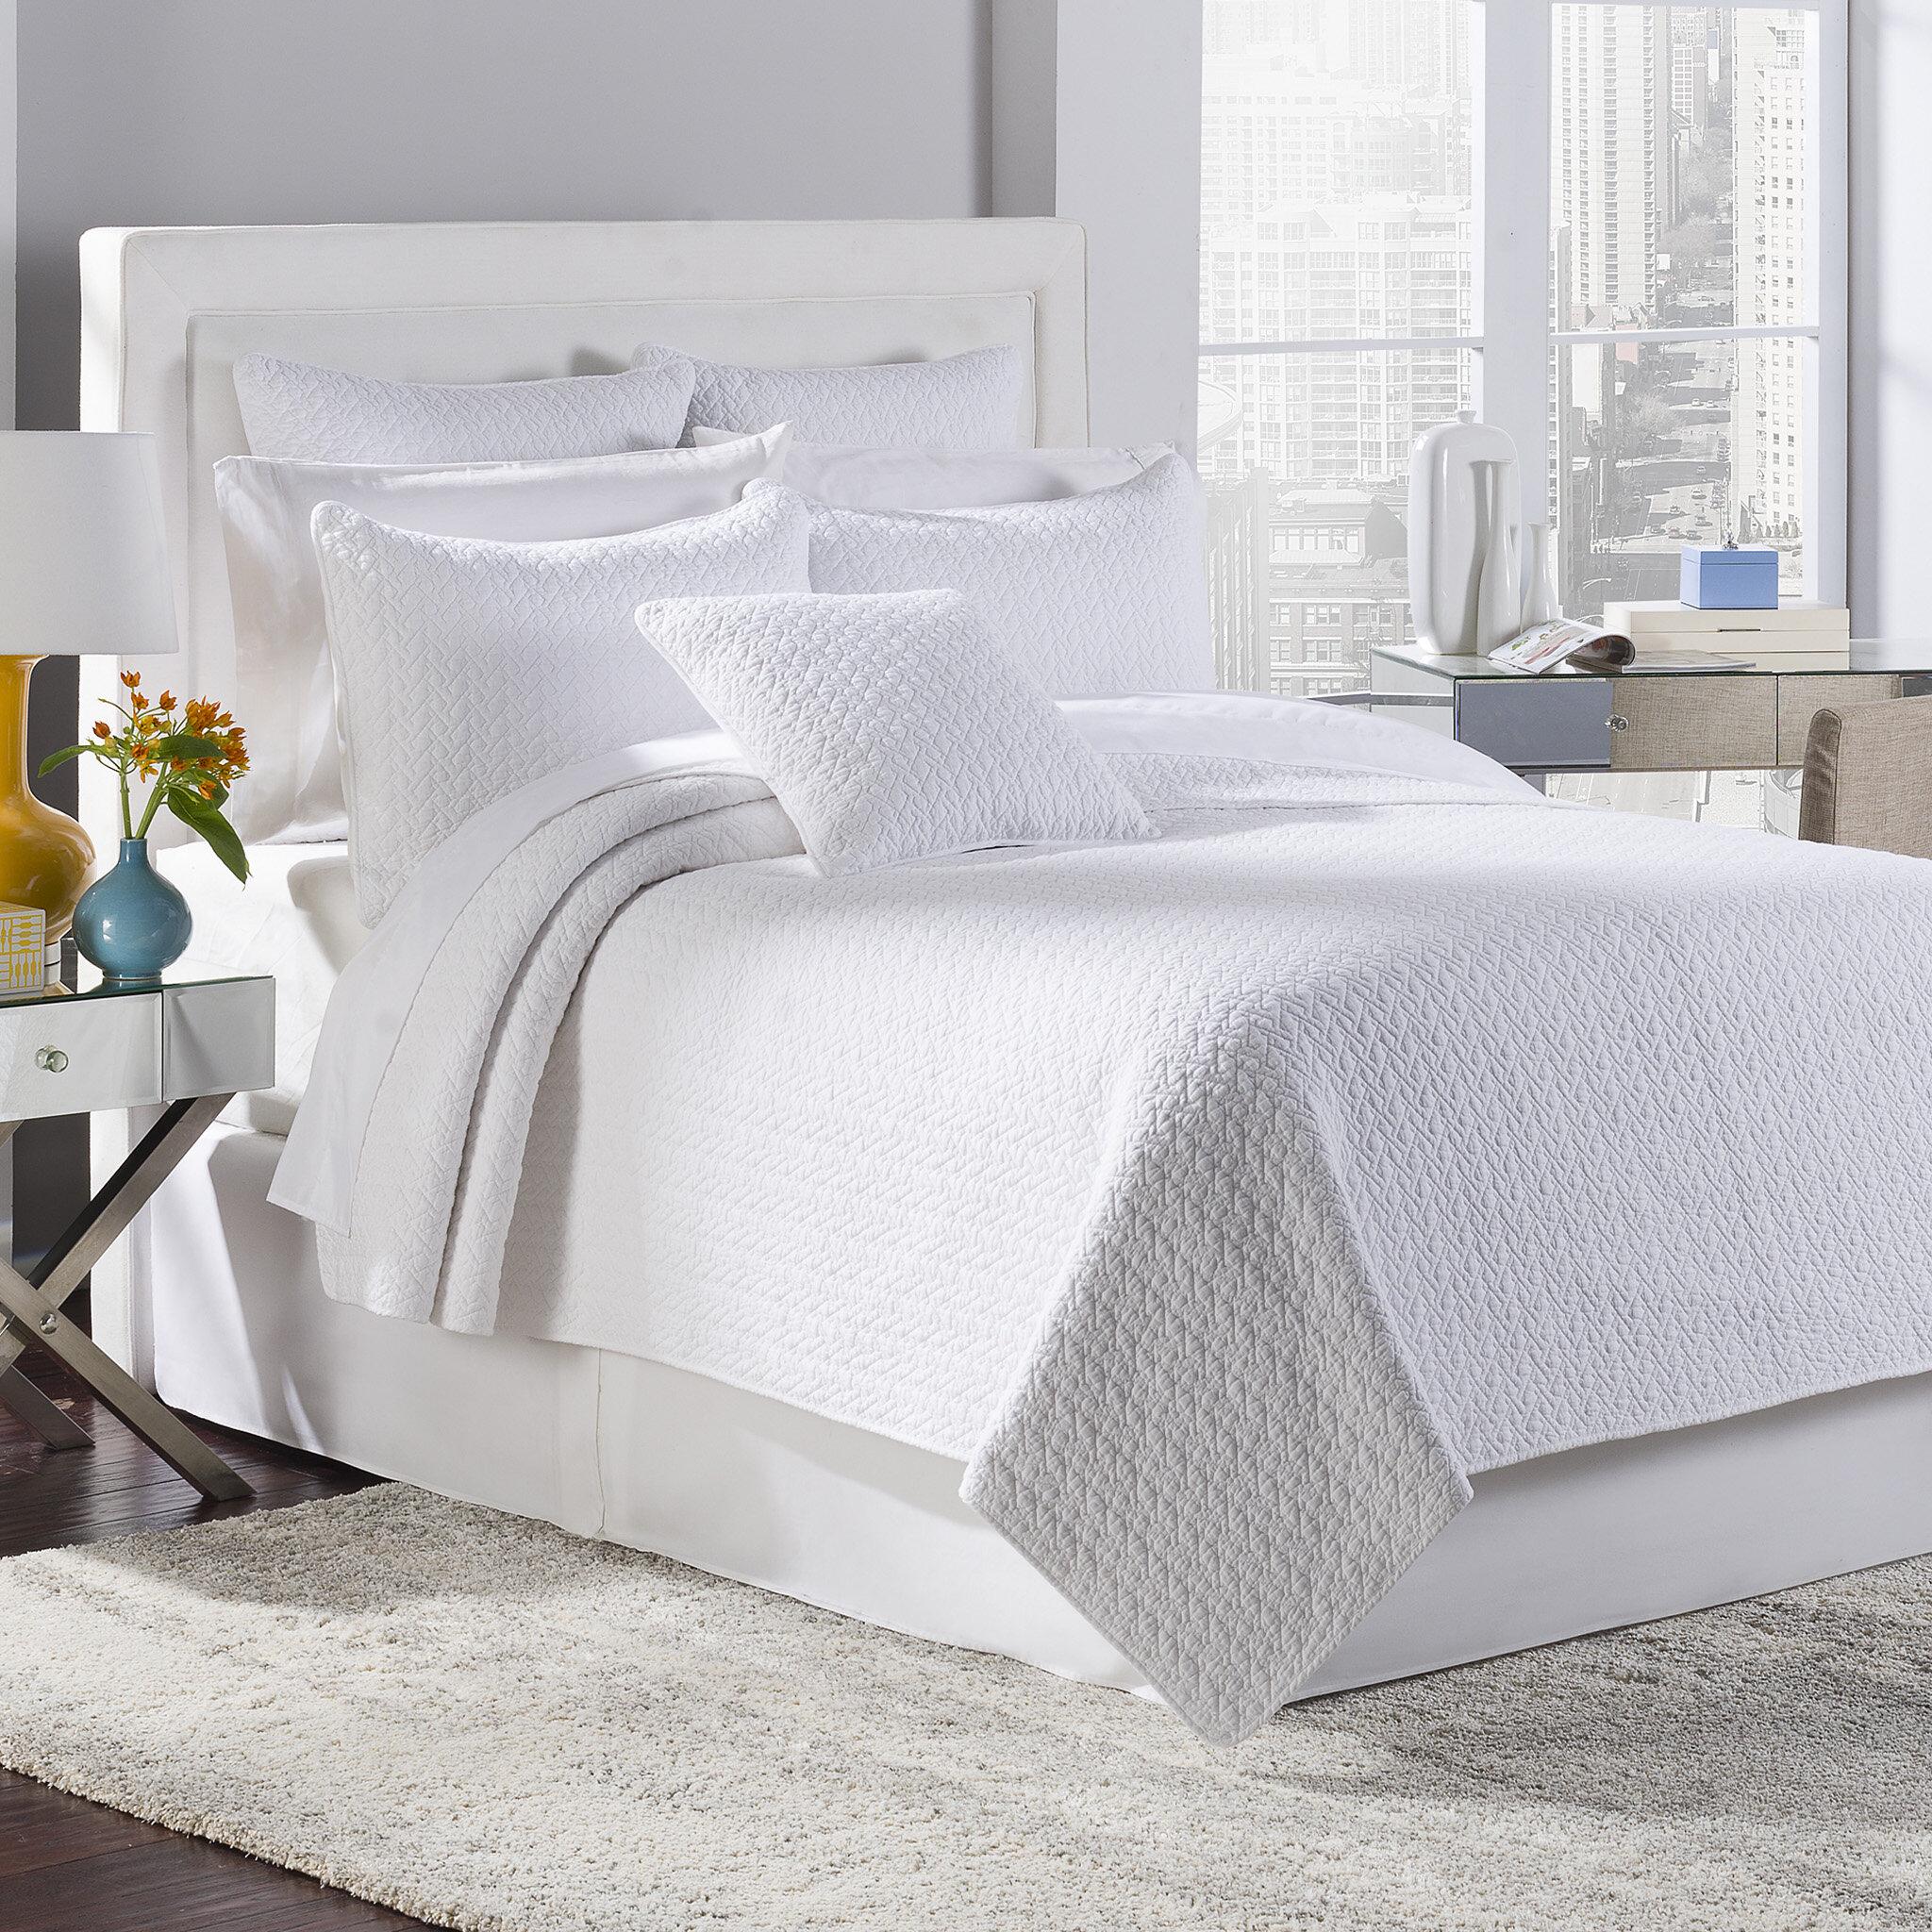 Gracie Oaks Mahesh Reversible Quilt Set & Reviews | Wayfair